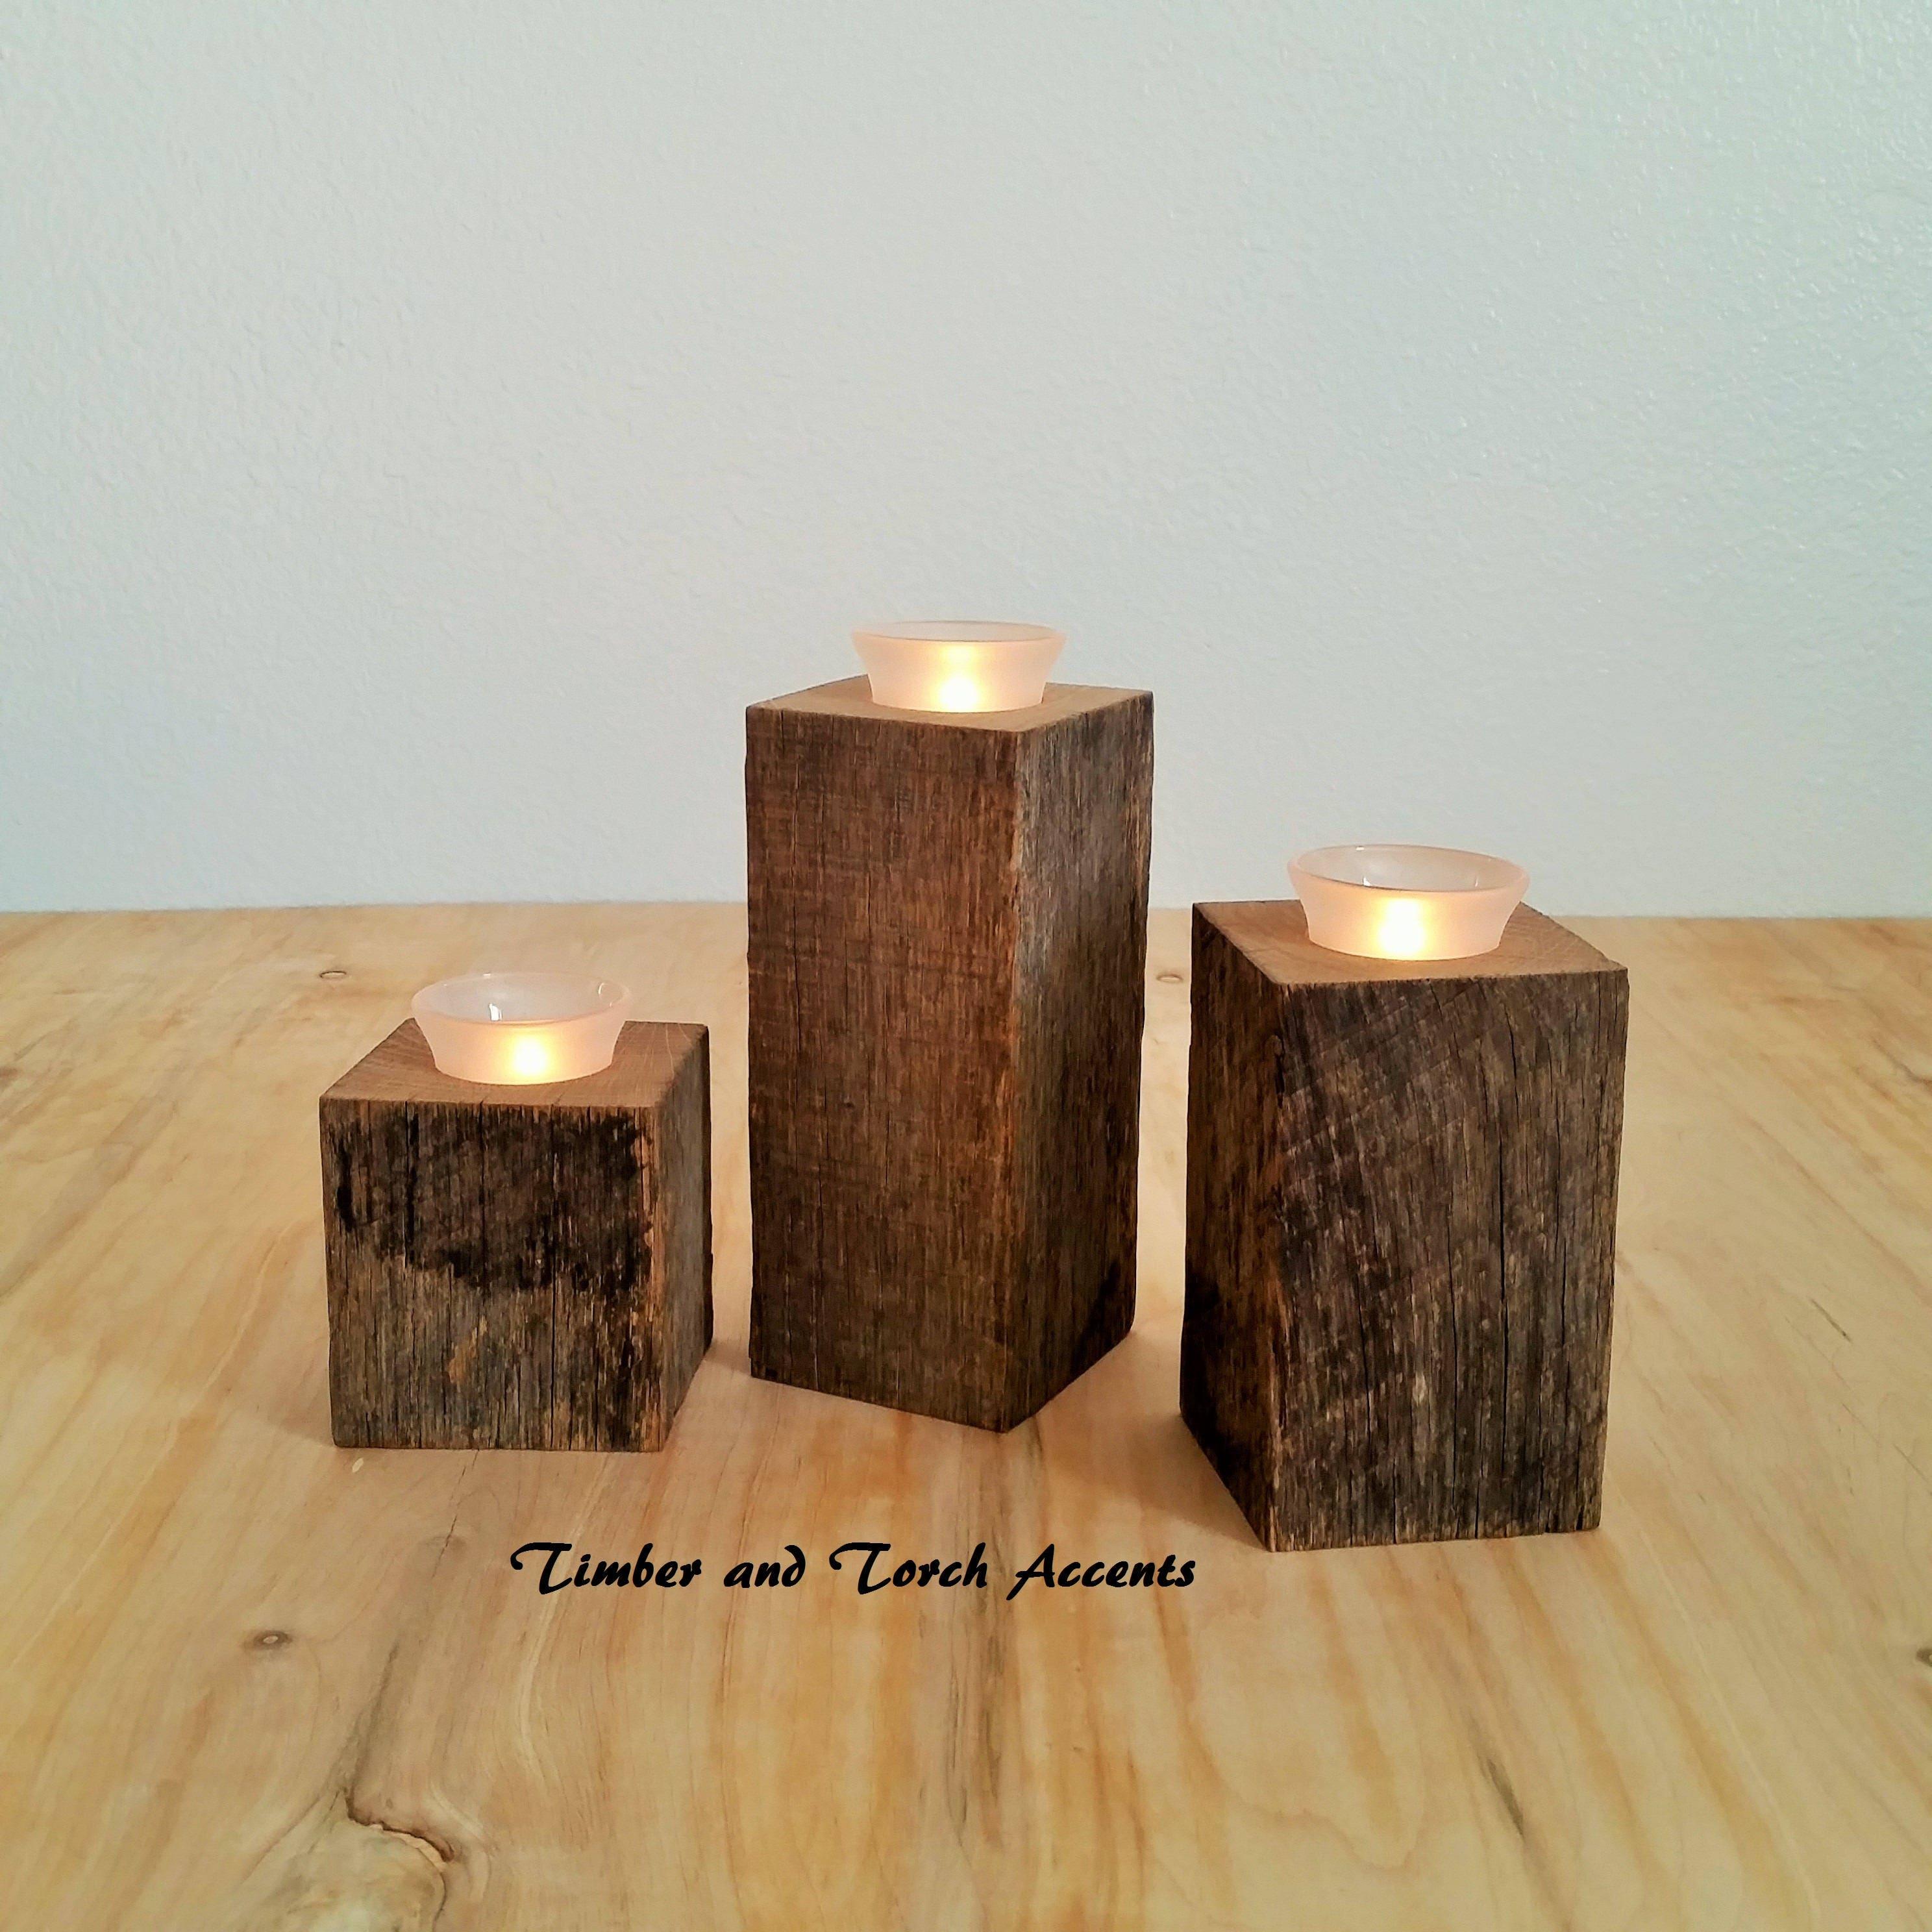 Swedish Wooden Tea Light Holder Holders Set Holder Candle Wedding Tealight Wood